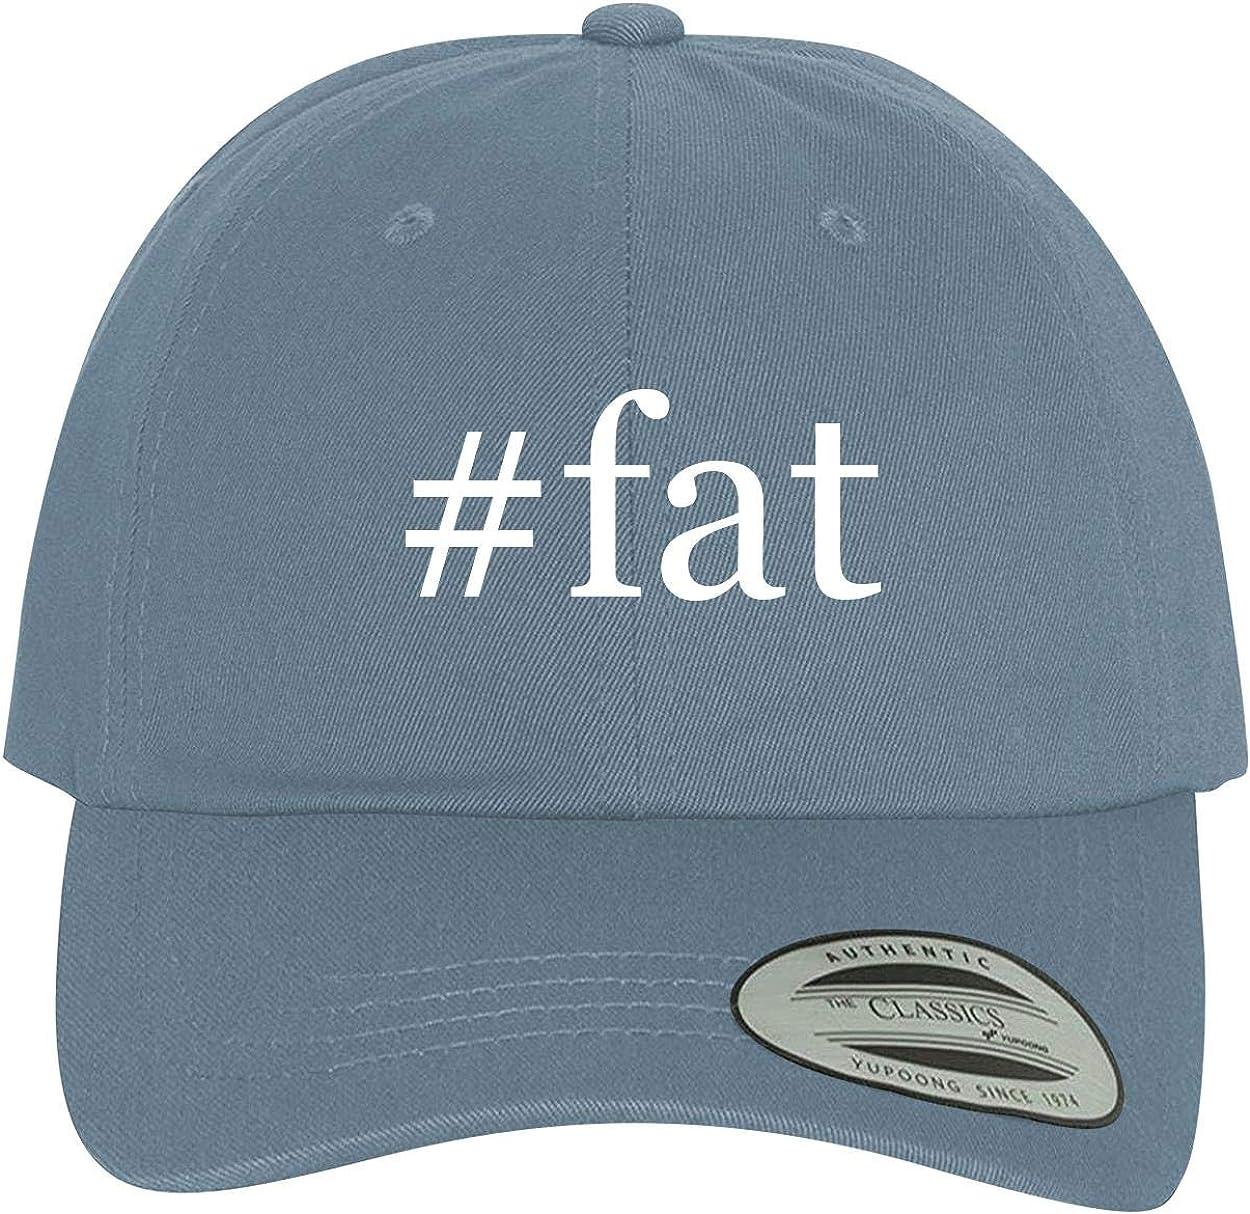 Comfortable Dad Hat Baseball Cap BH Cool Designs #Fat